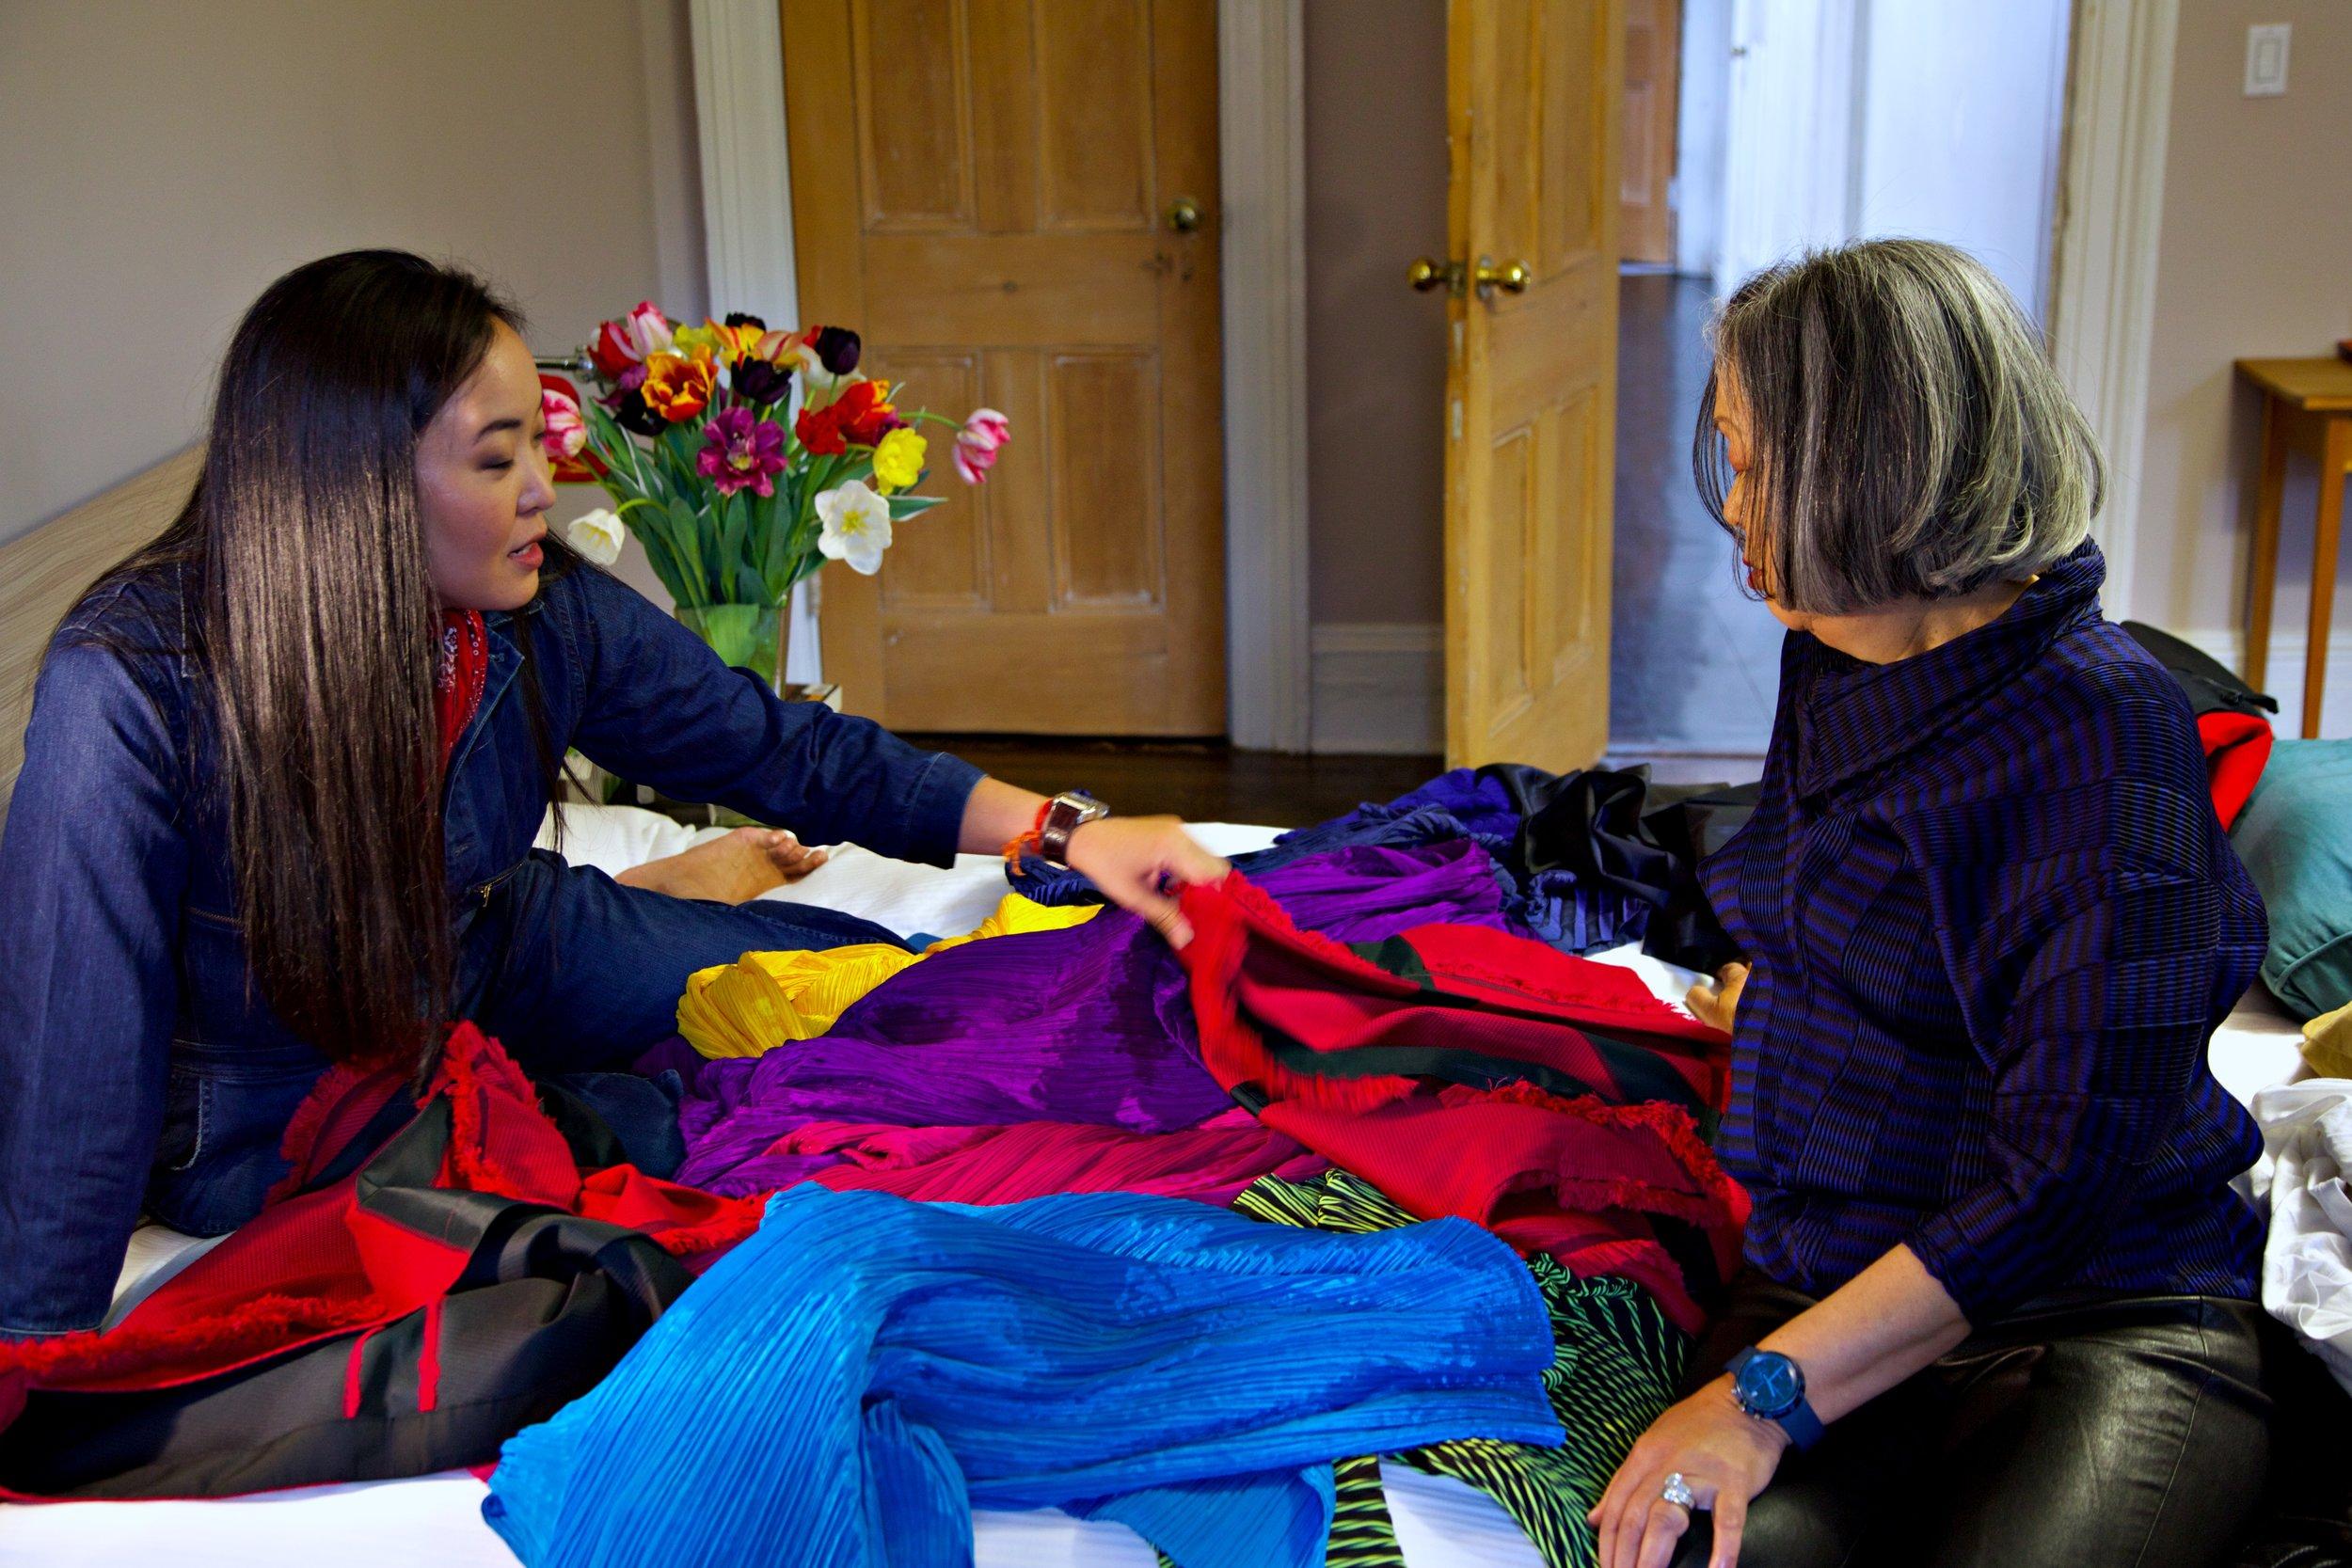 Aya and Jun looking through Jun's collection of Miyake scarves.